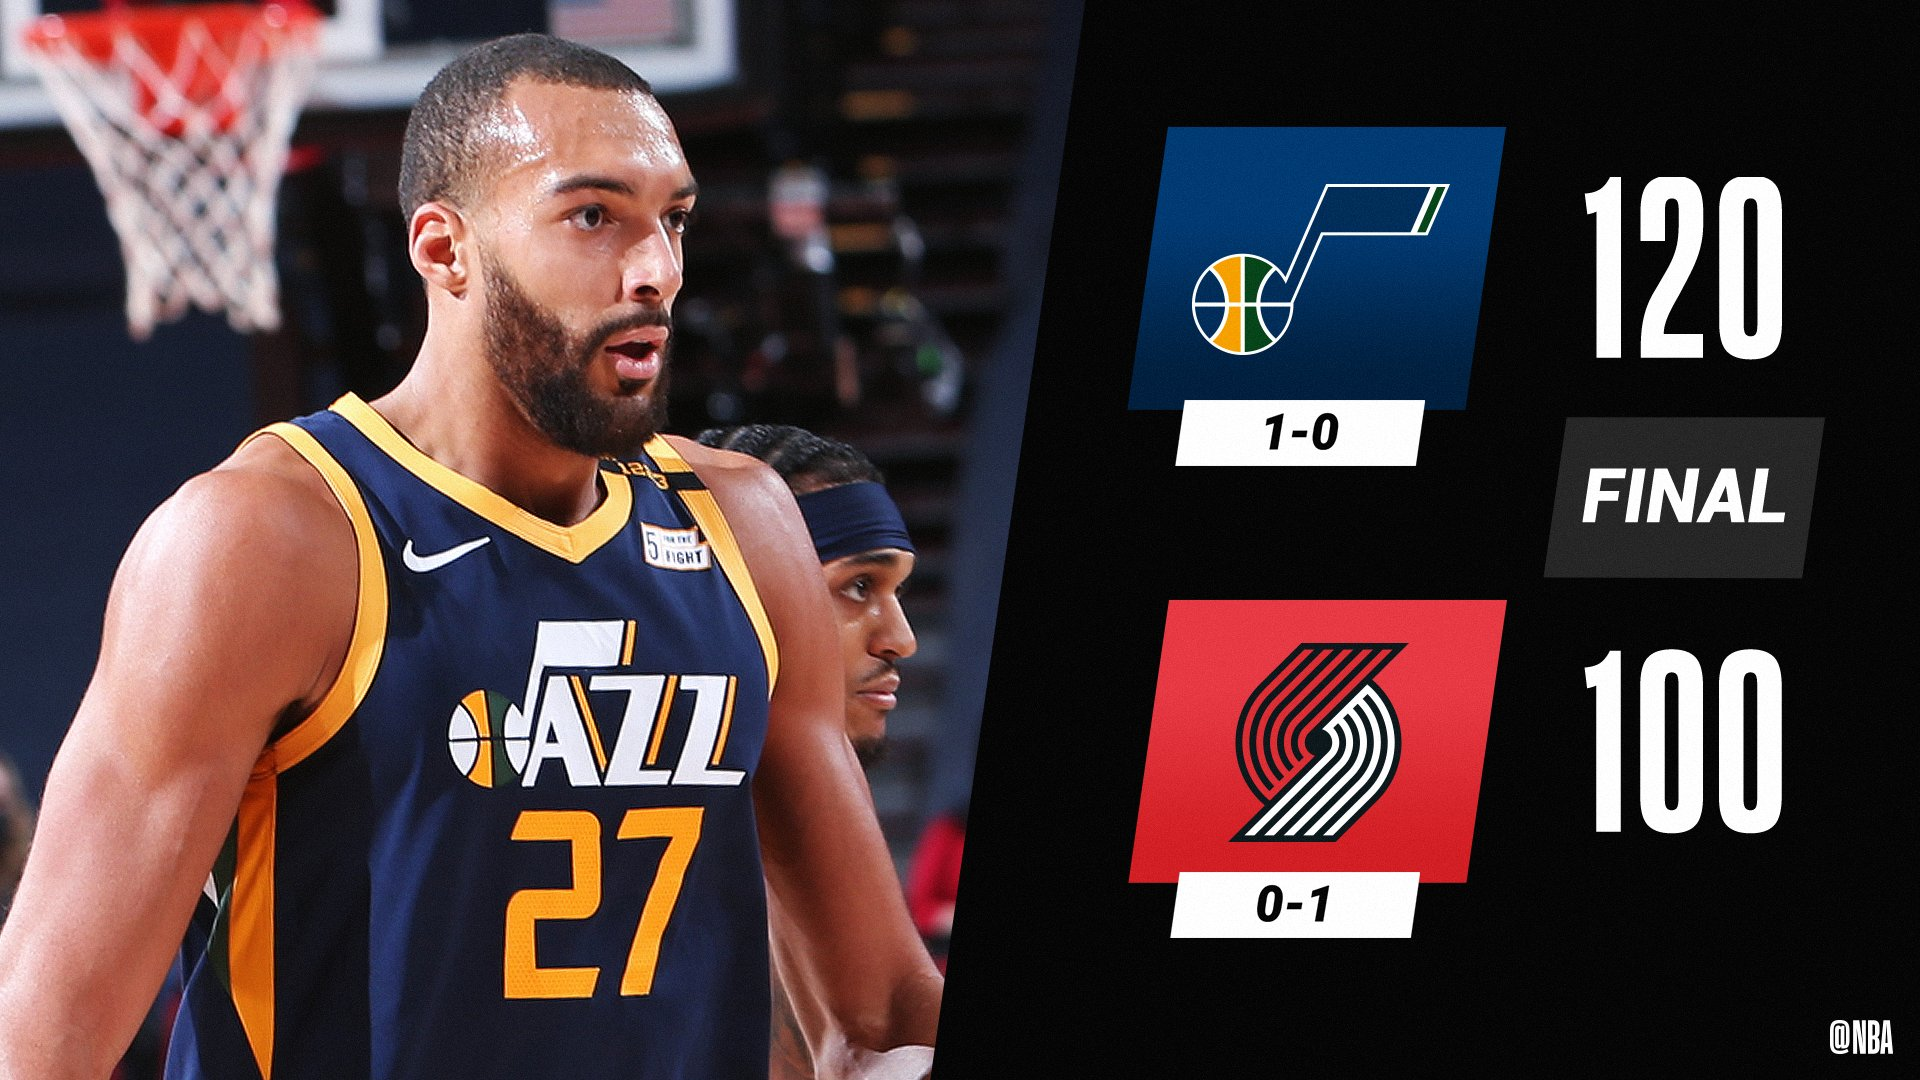 24-12-2